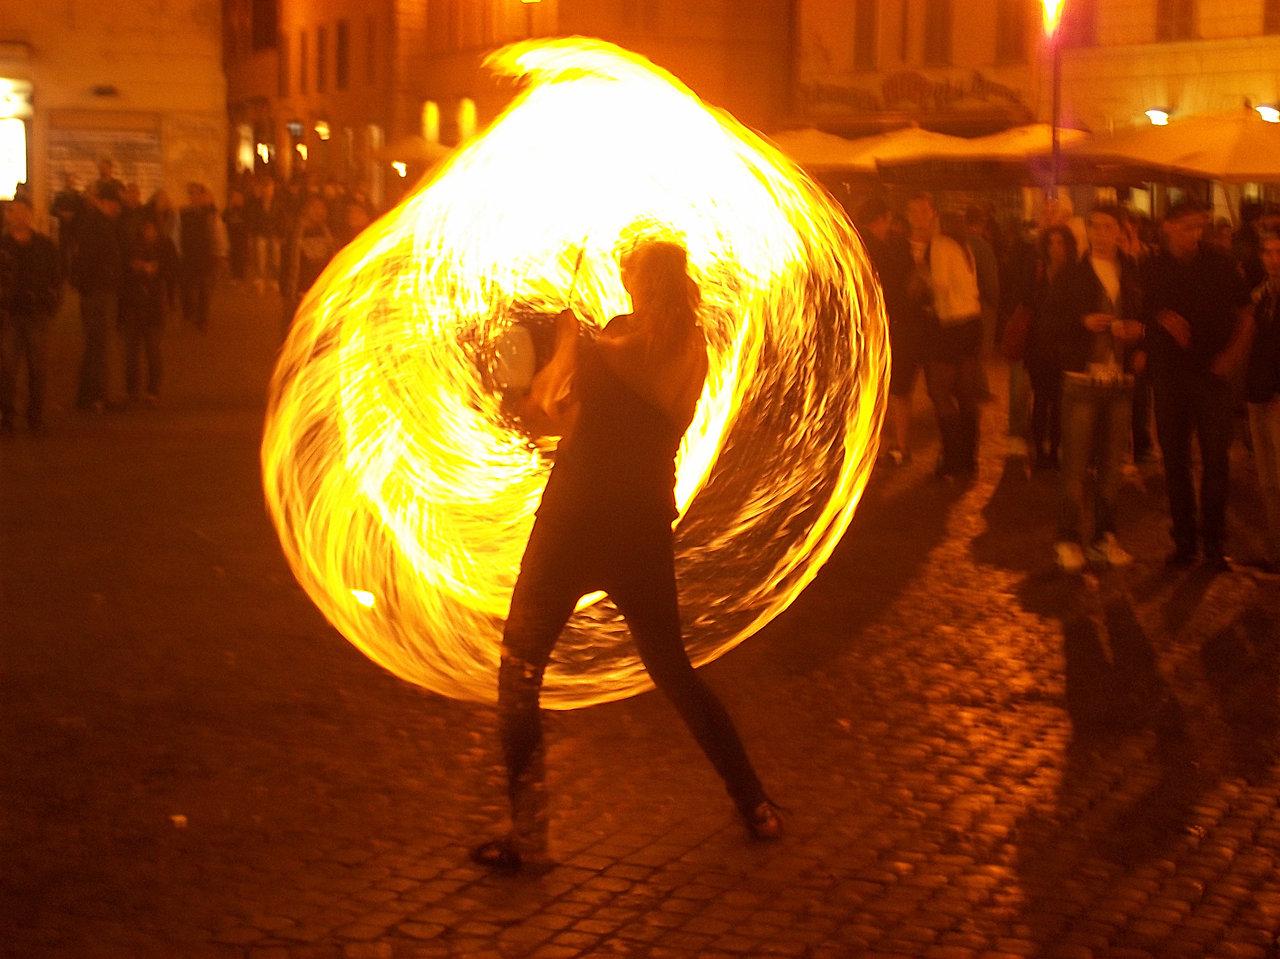 """FIRE-DANCER""_PHOTO TAKEN IN ROME"